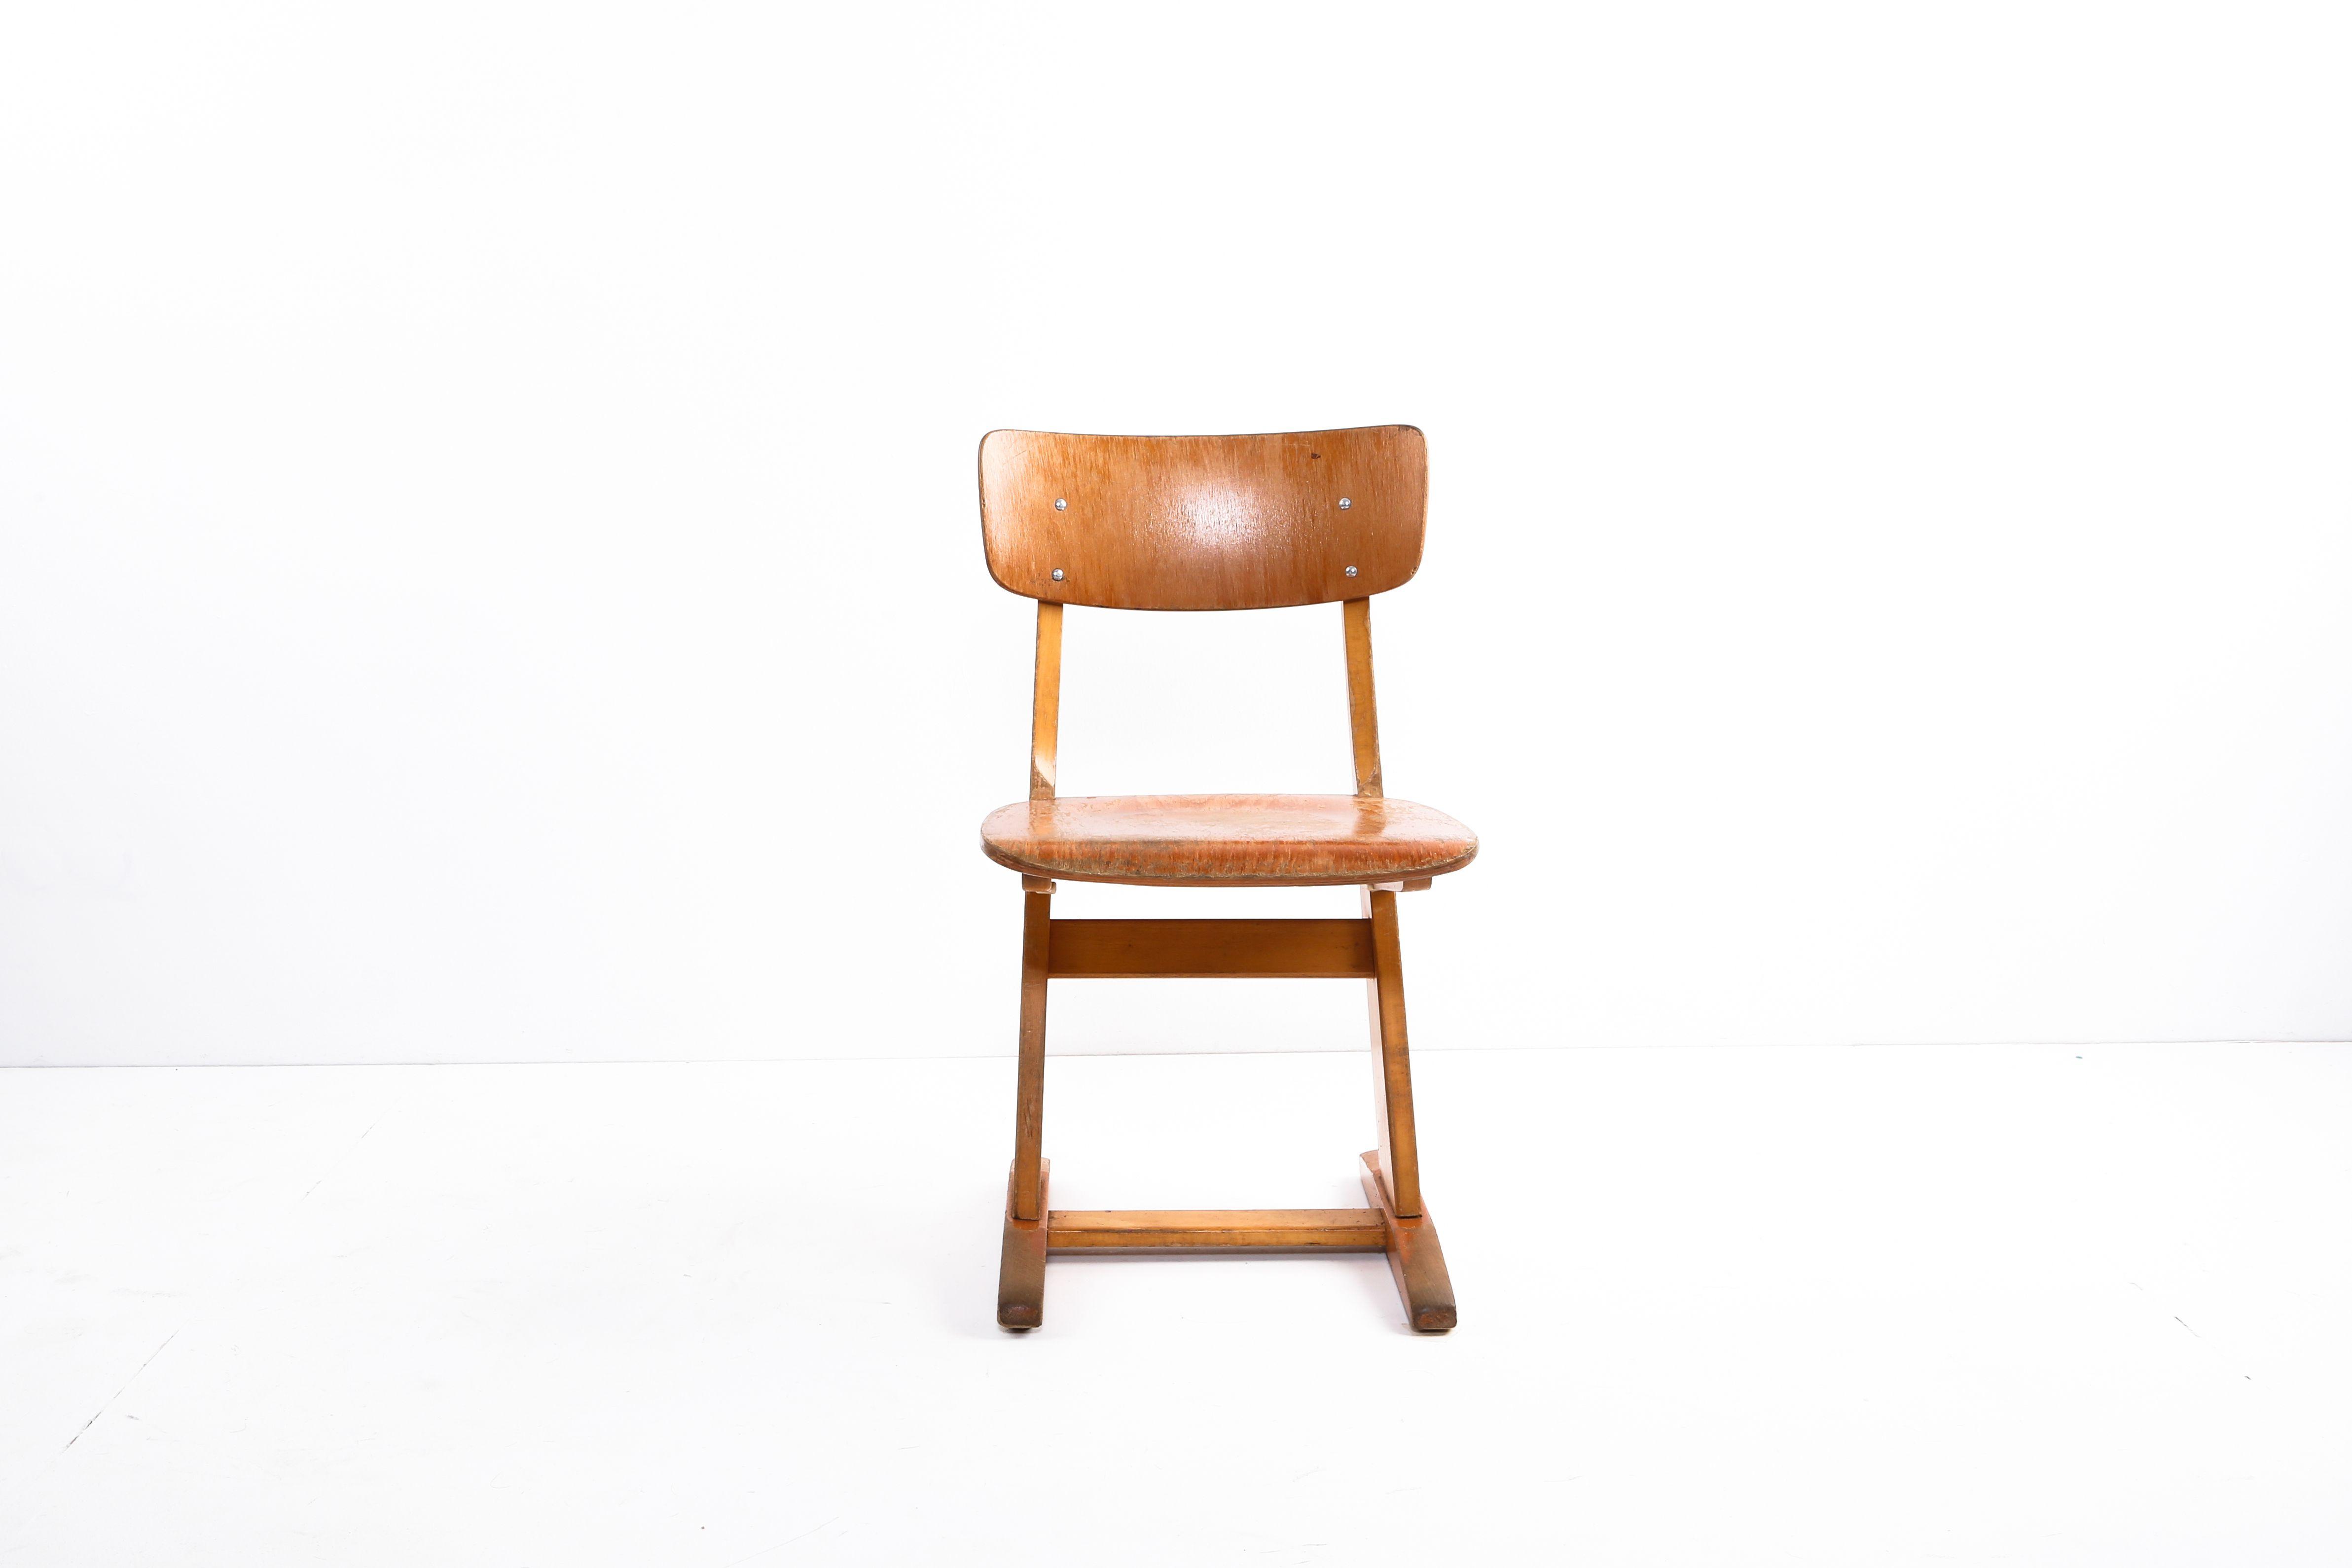 Zwei Schulstuhle Casala Schulstuhle Kinderstuhle Stuhle